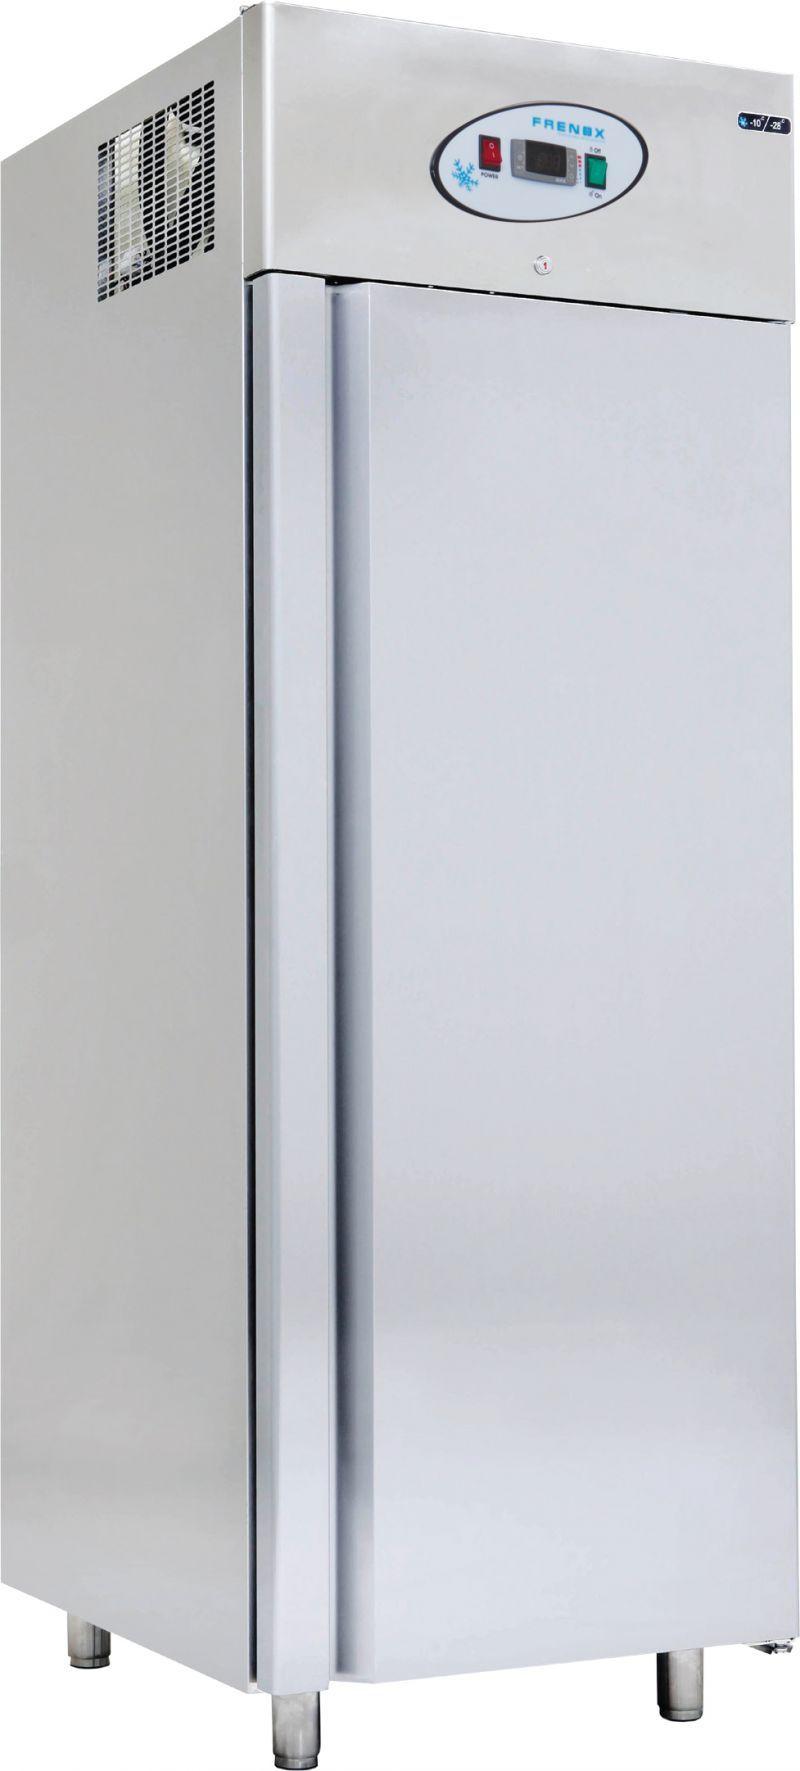 Dulap frigorific  patiserie simplu cu usa din sticla   Frigider inox patiserie 700 lt